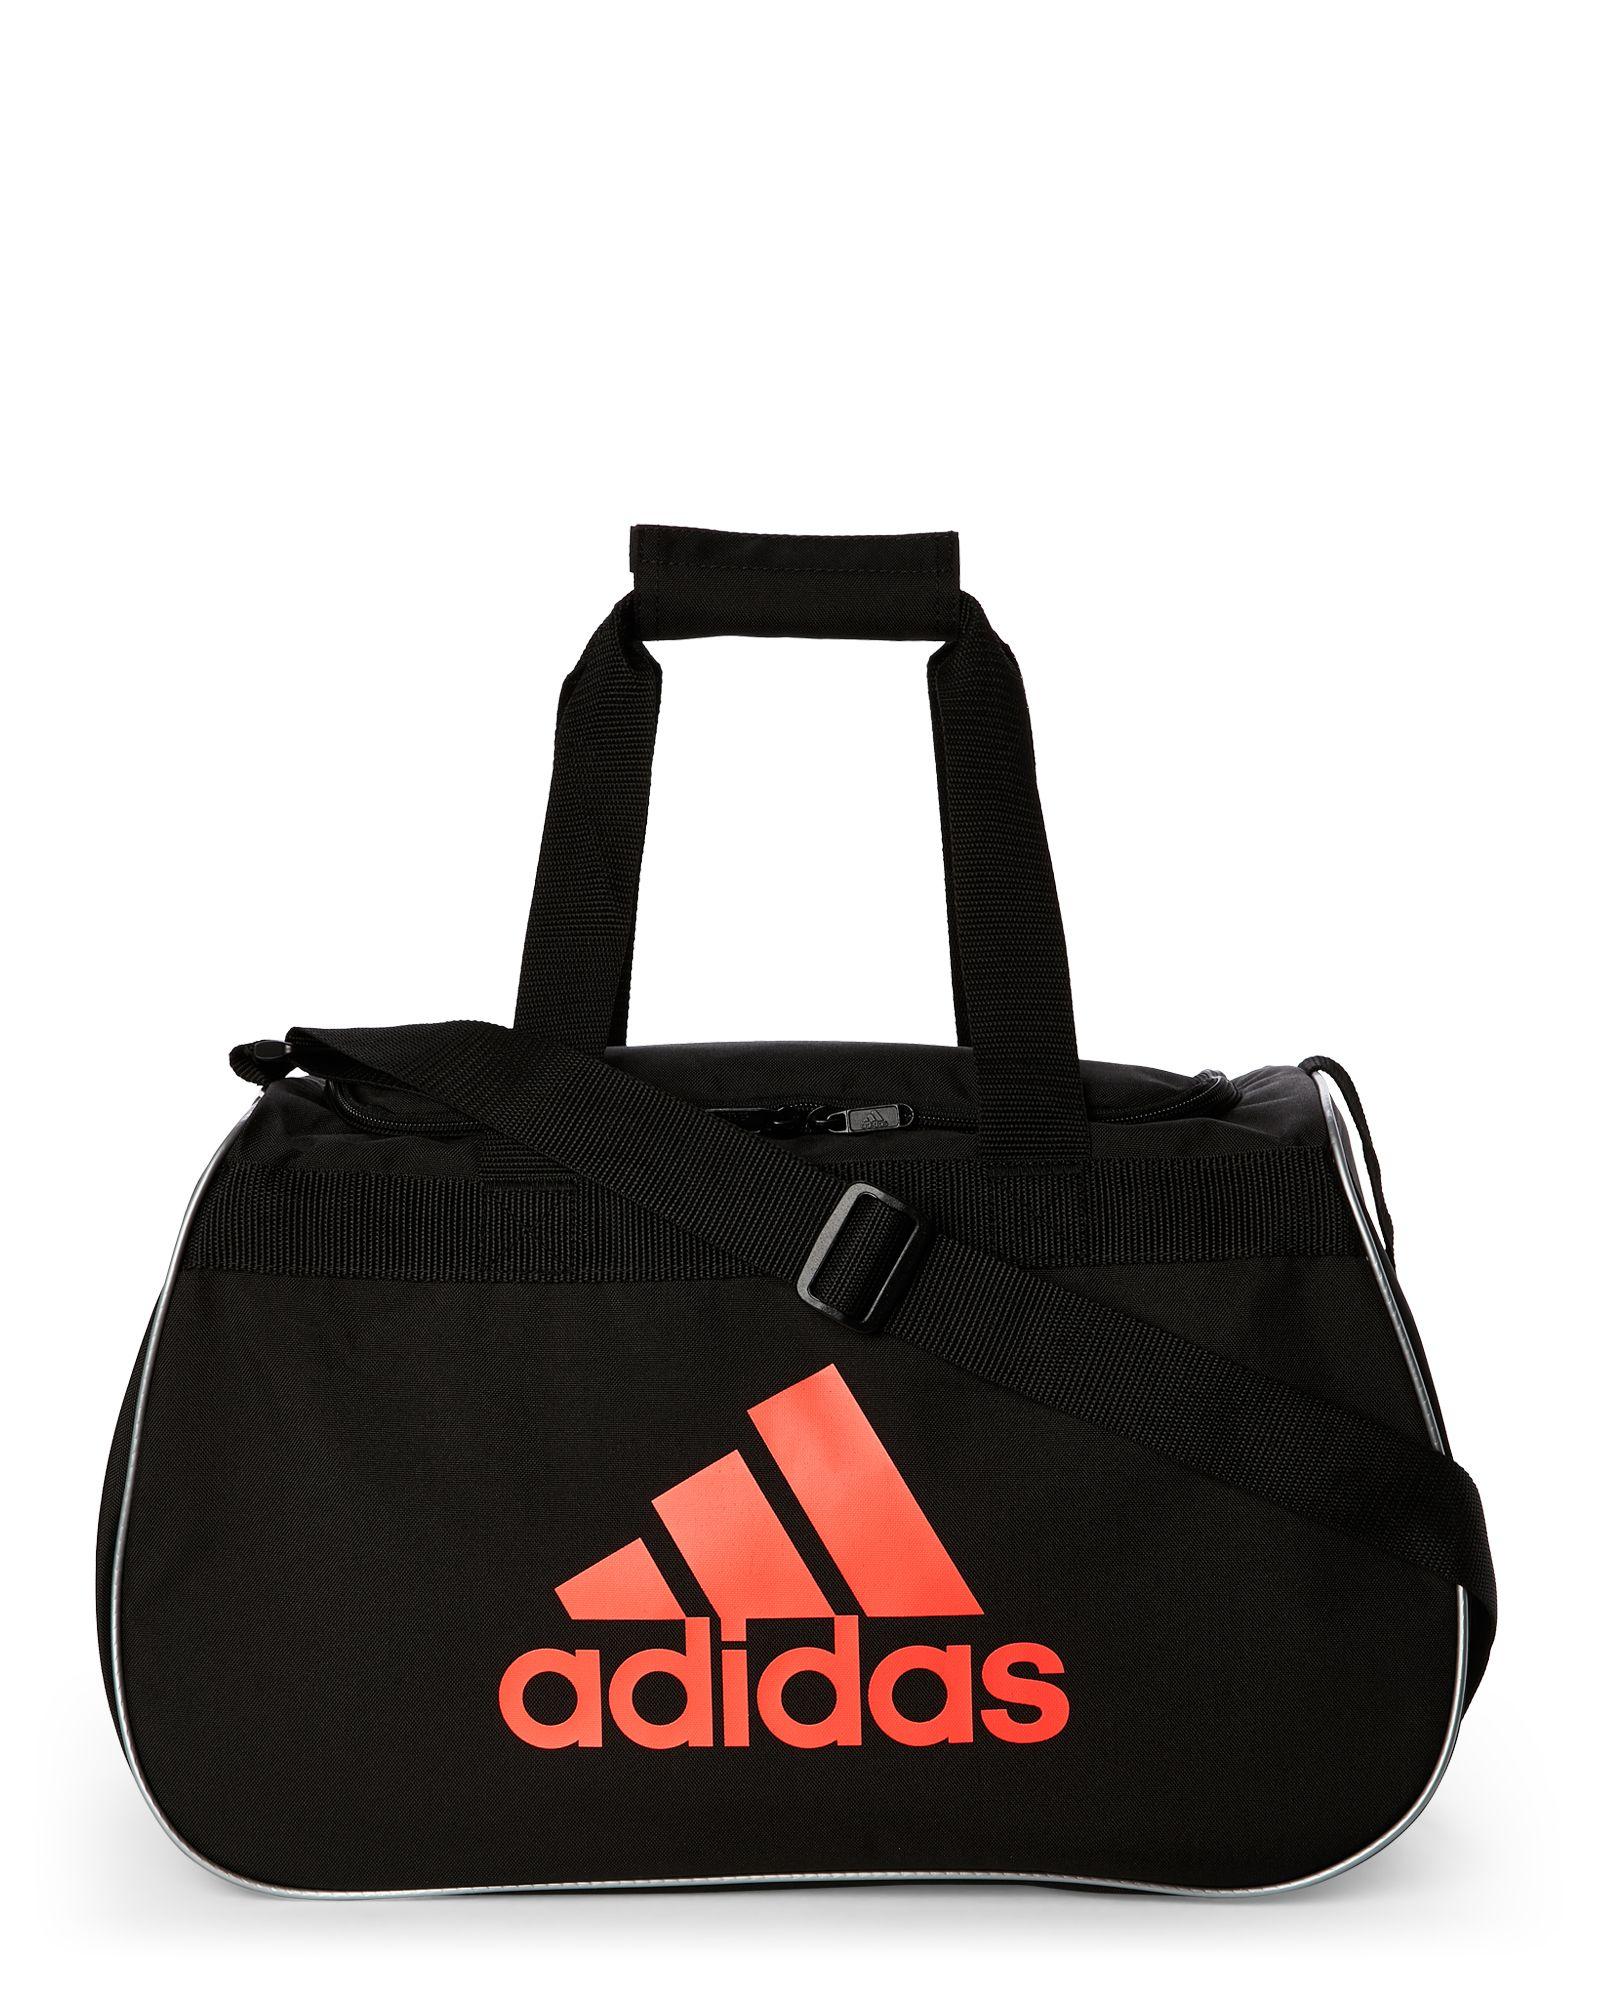 53d59a7f0 Black Diablo Small Duffel Bag | *Luggage & Bags* | Adidas duffle bag ...